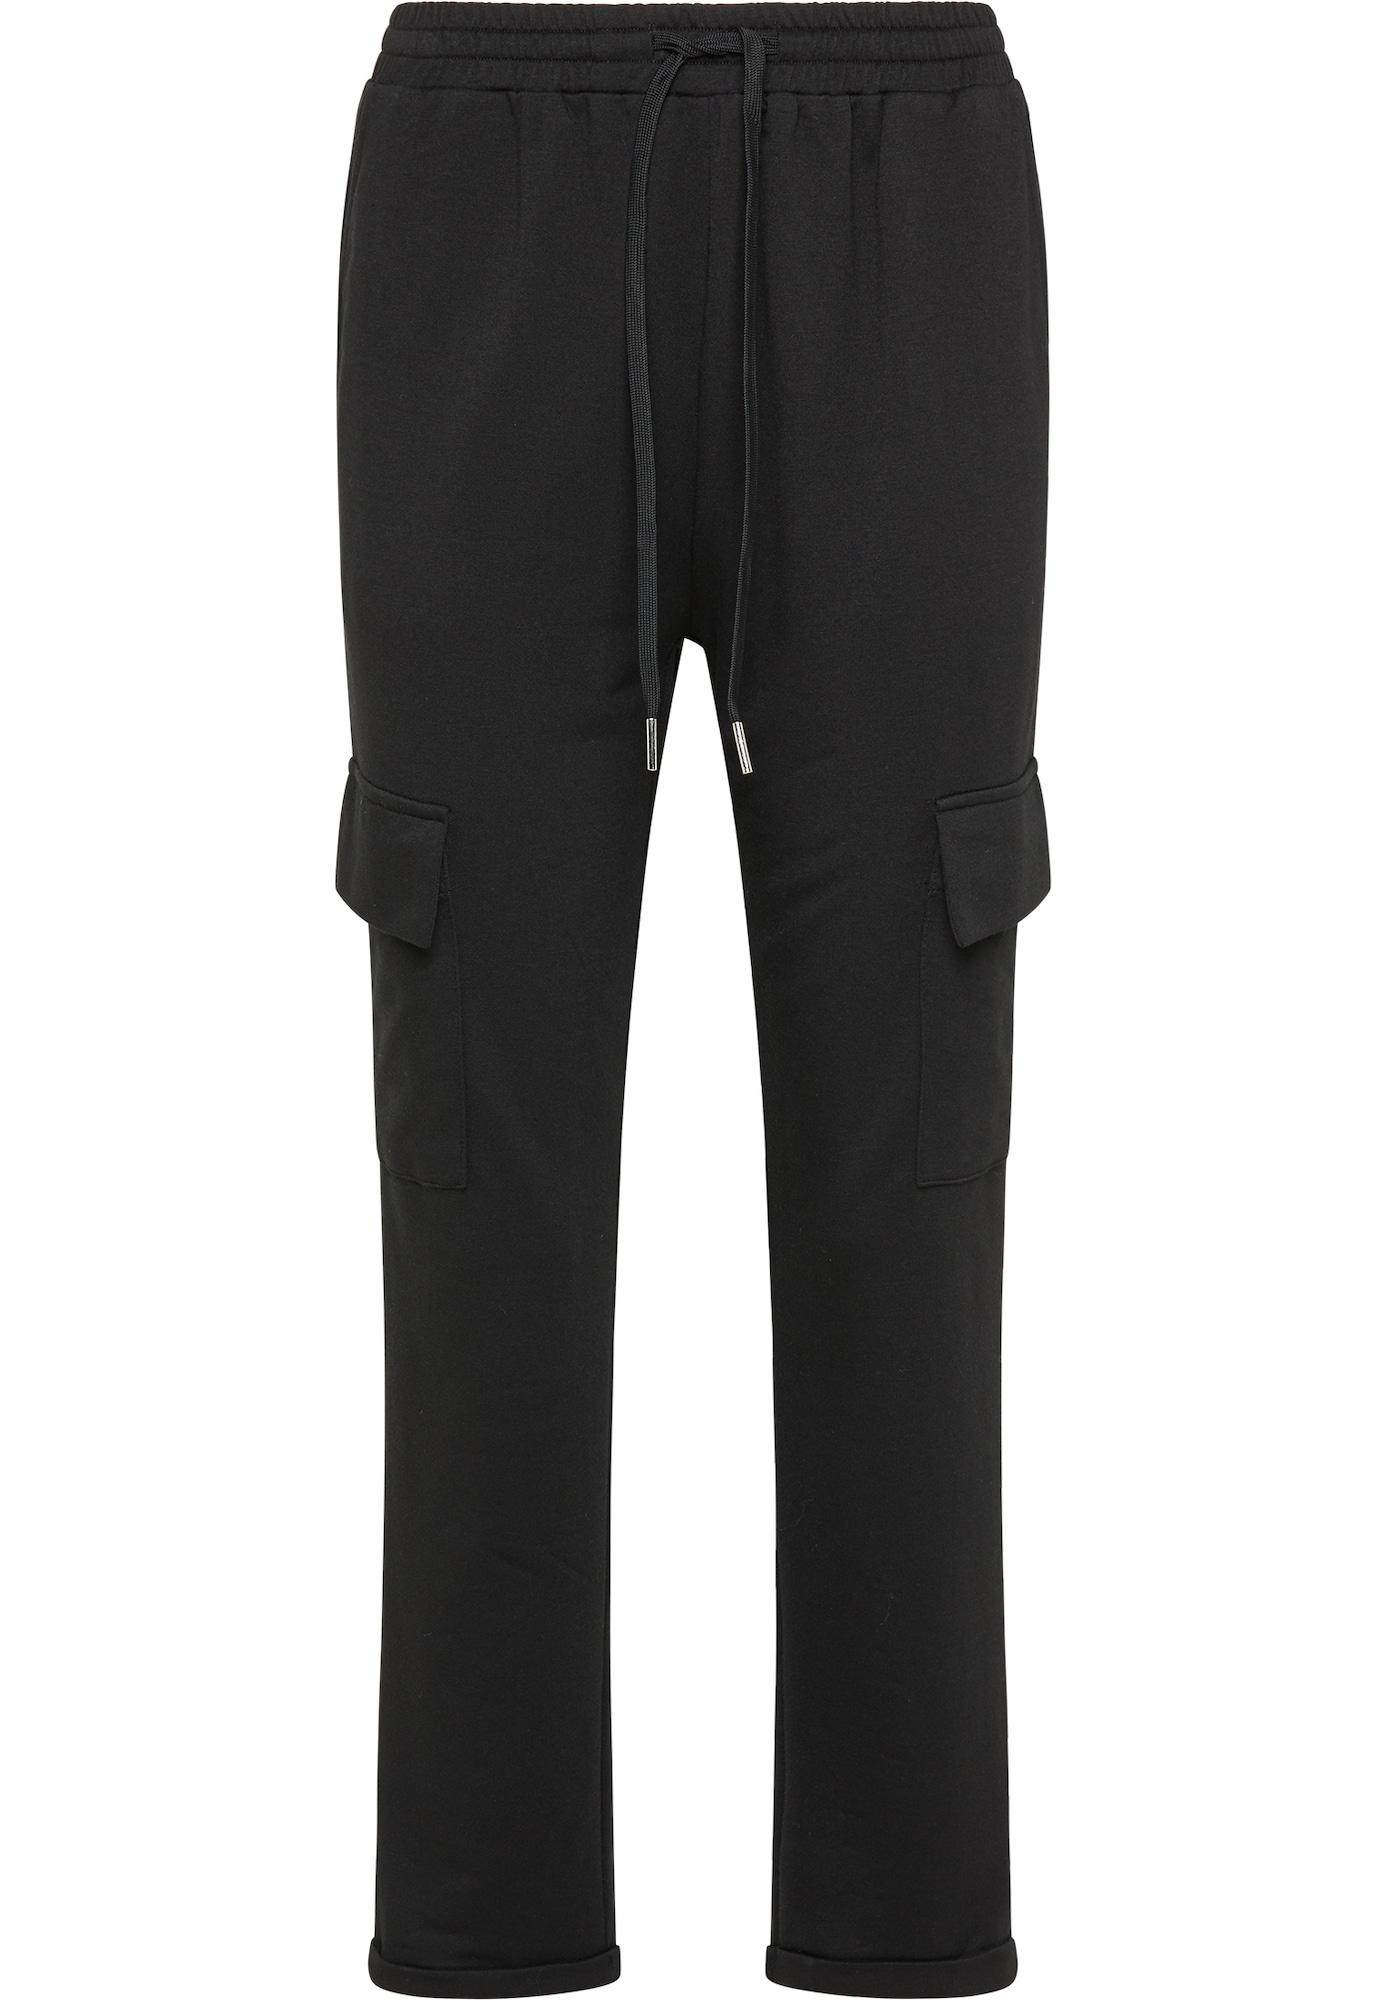 usha BLUE LABEL Laisvo stiliaus kelnės juoda